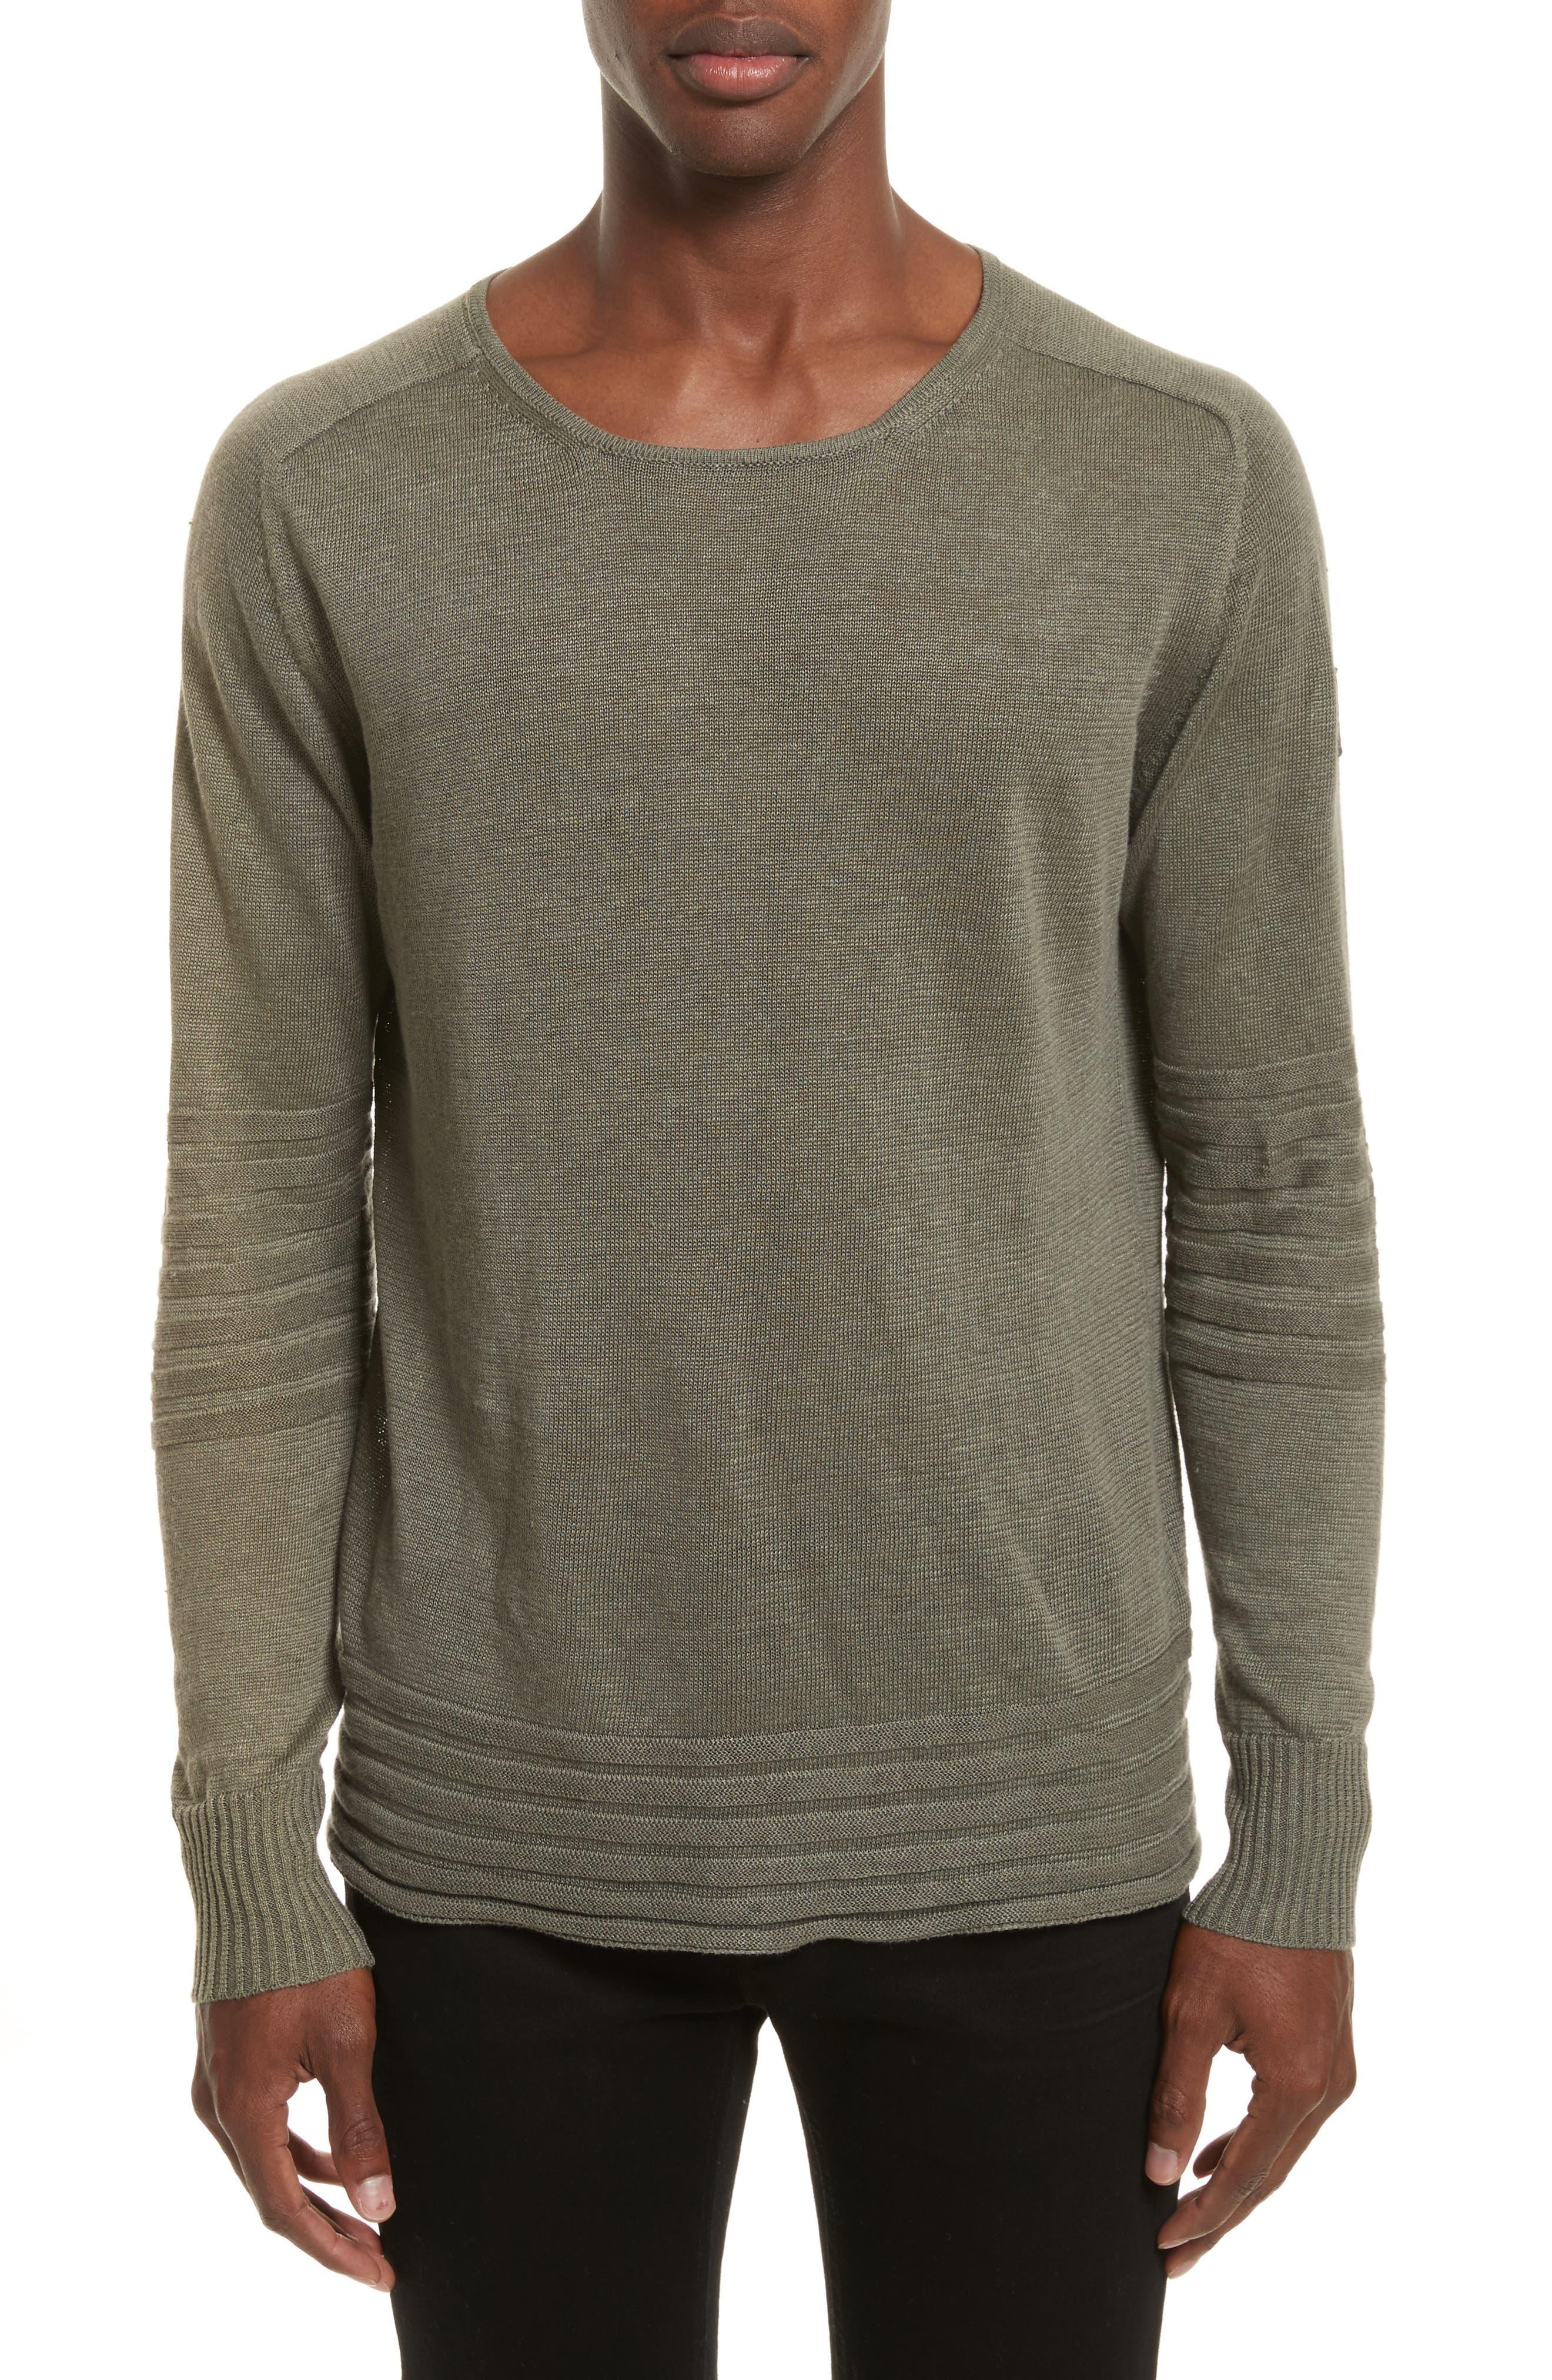 Exford Linen Crewneck Sweater,                             Main thumbnail 2, color,